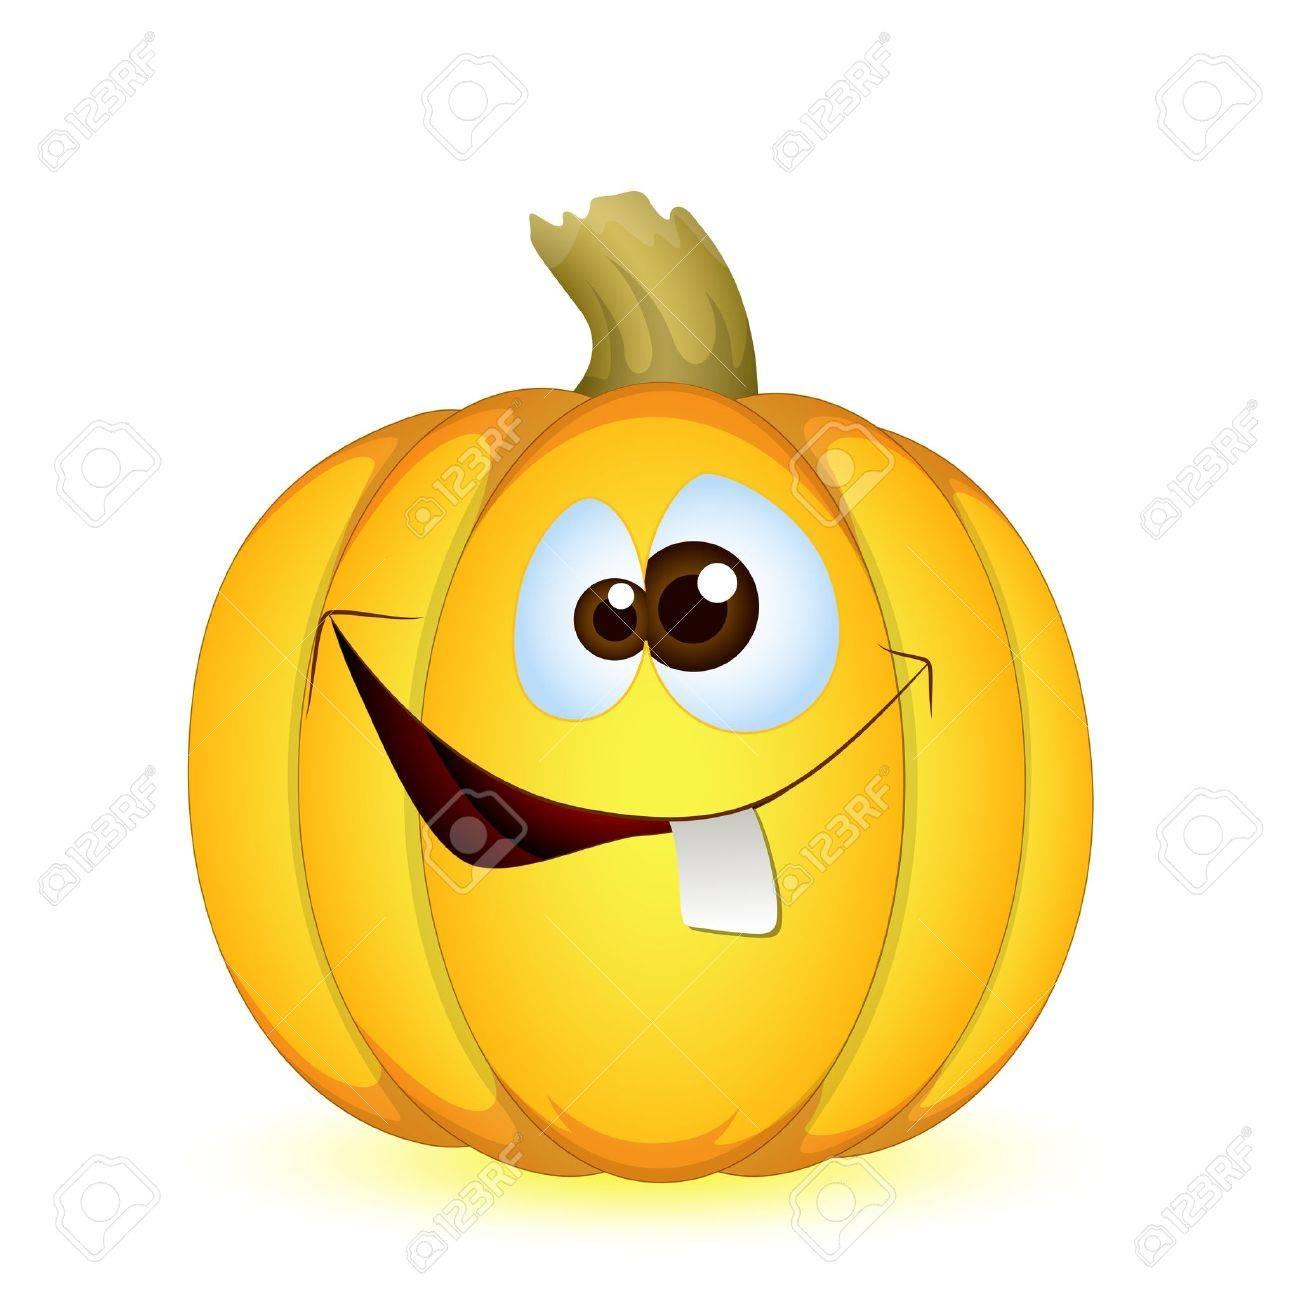 funny halloween pumpkin royalty free cliparts, vectors, and stock